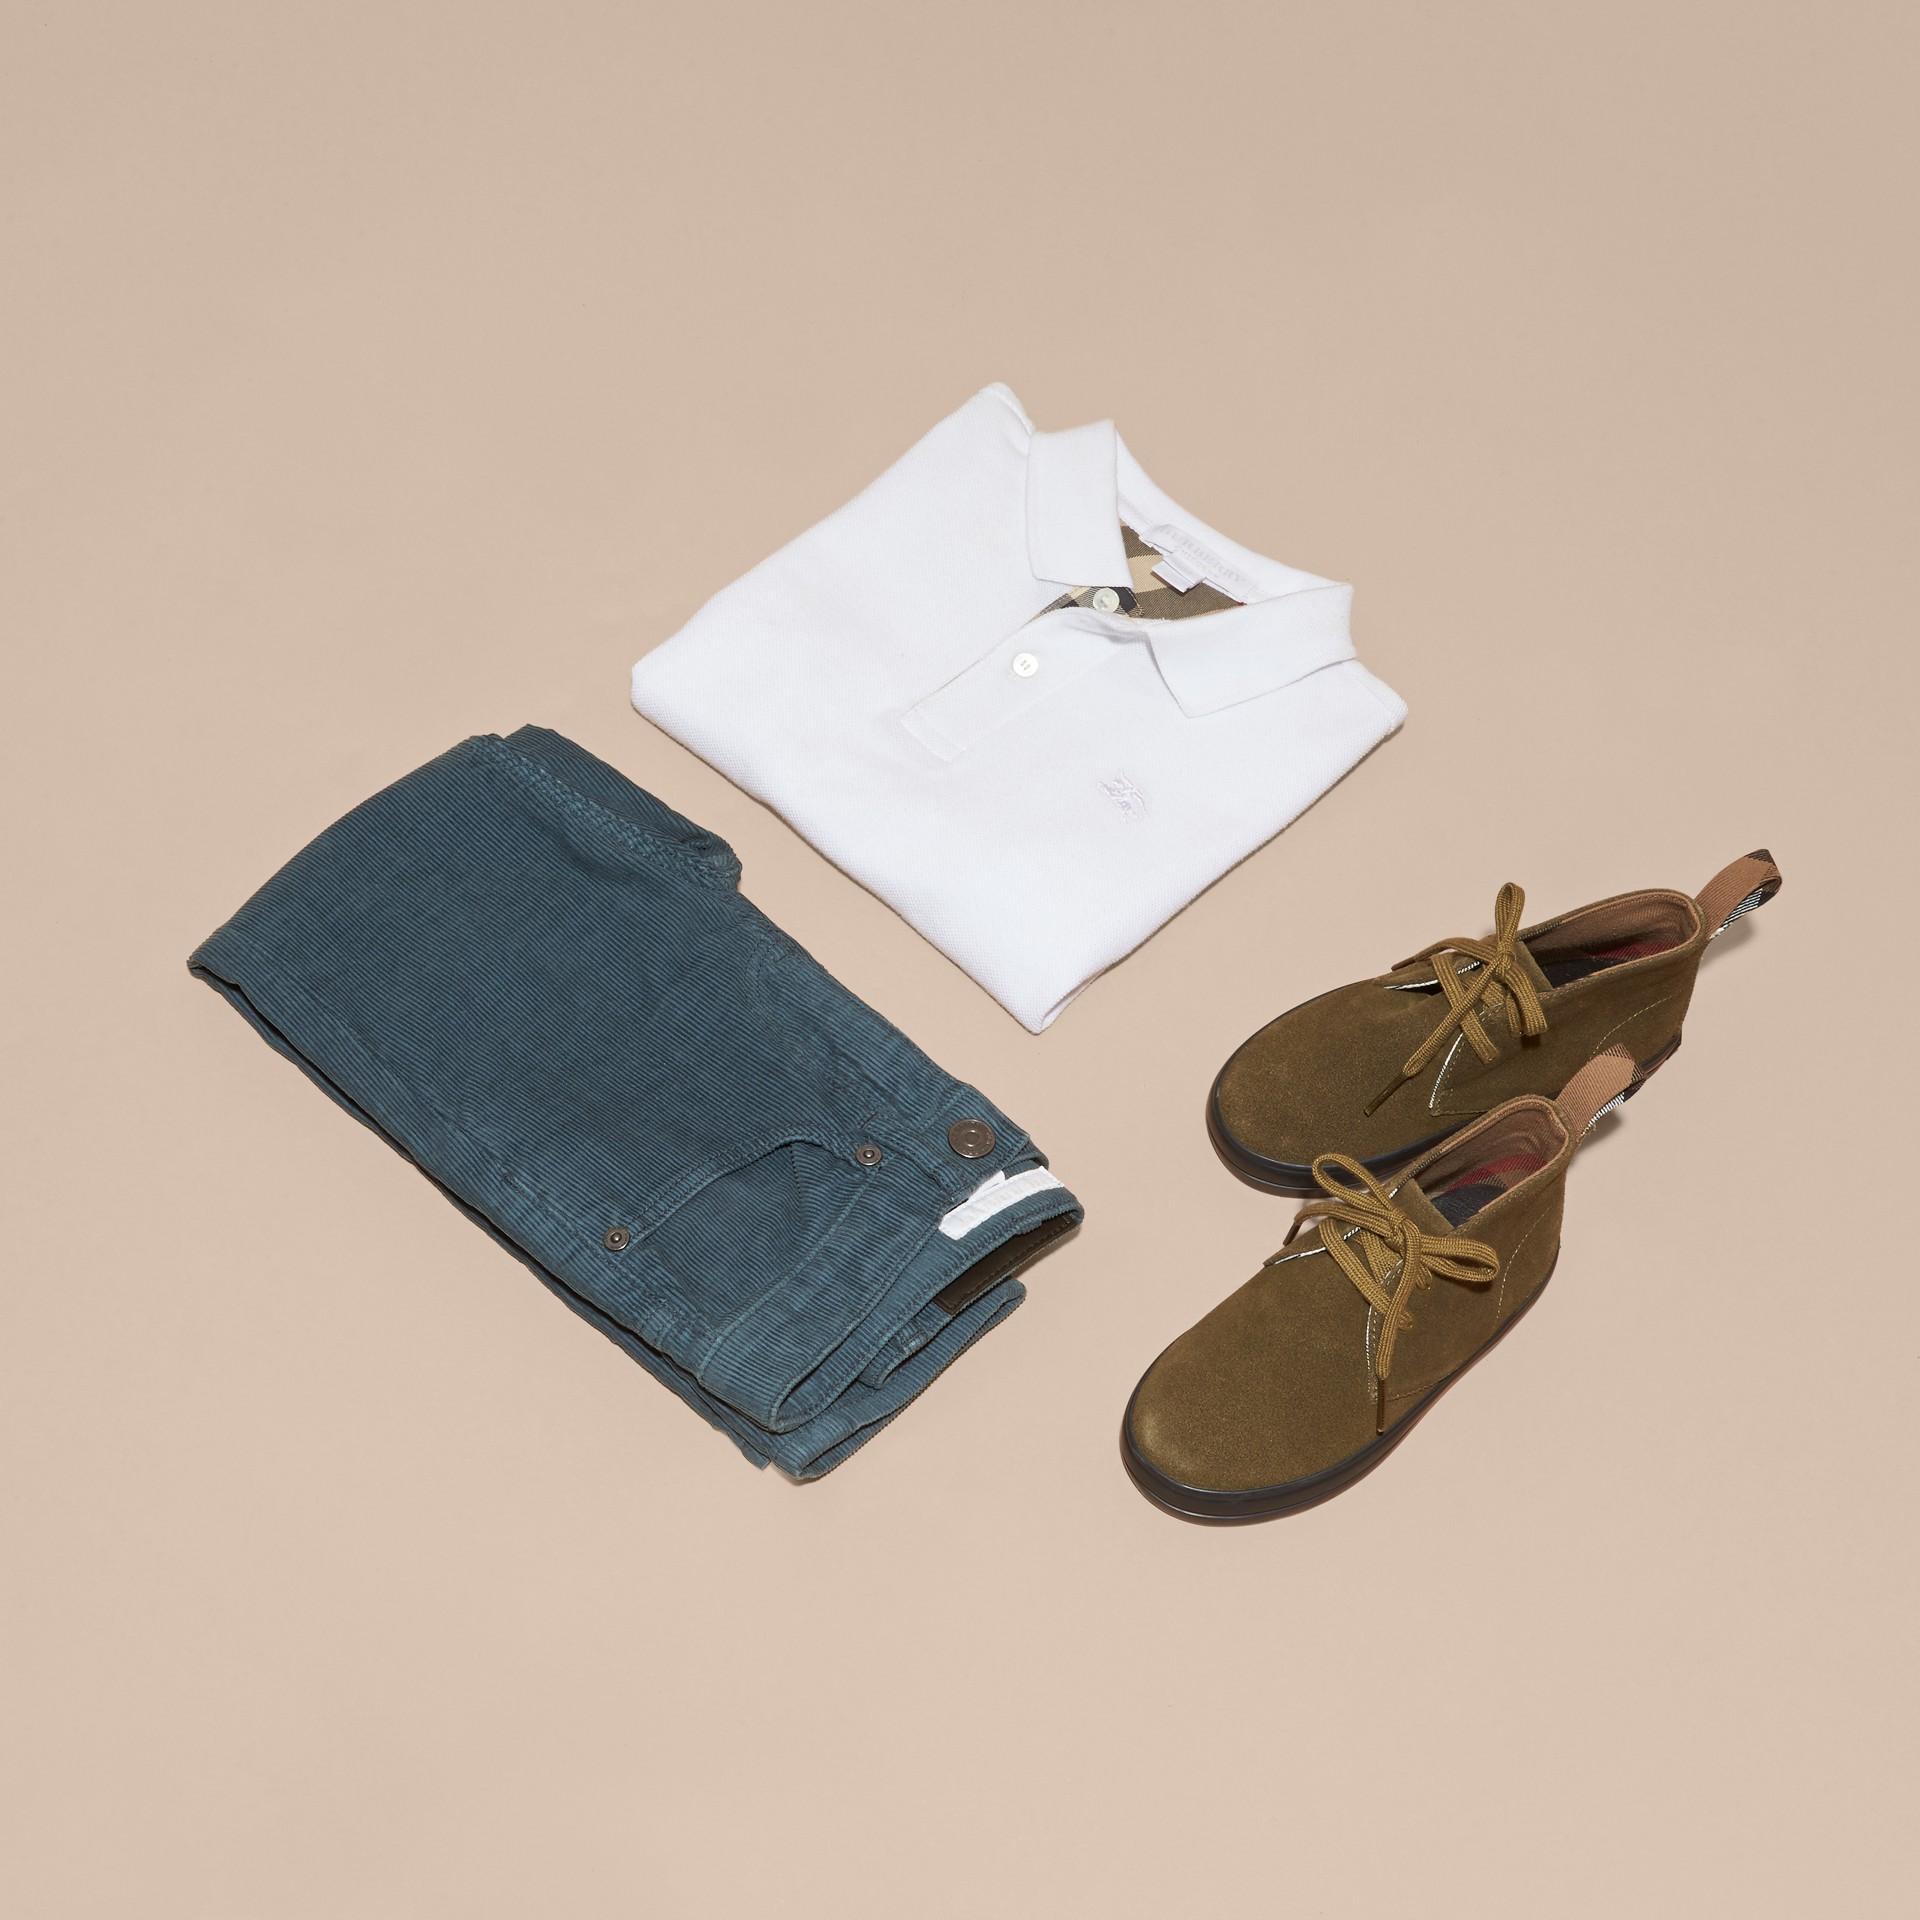 Blu minerale Jeans in corduroy stretch Blu Minerale - immagine della galleria 5